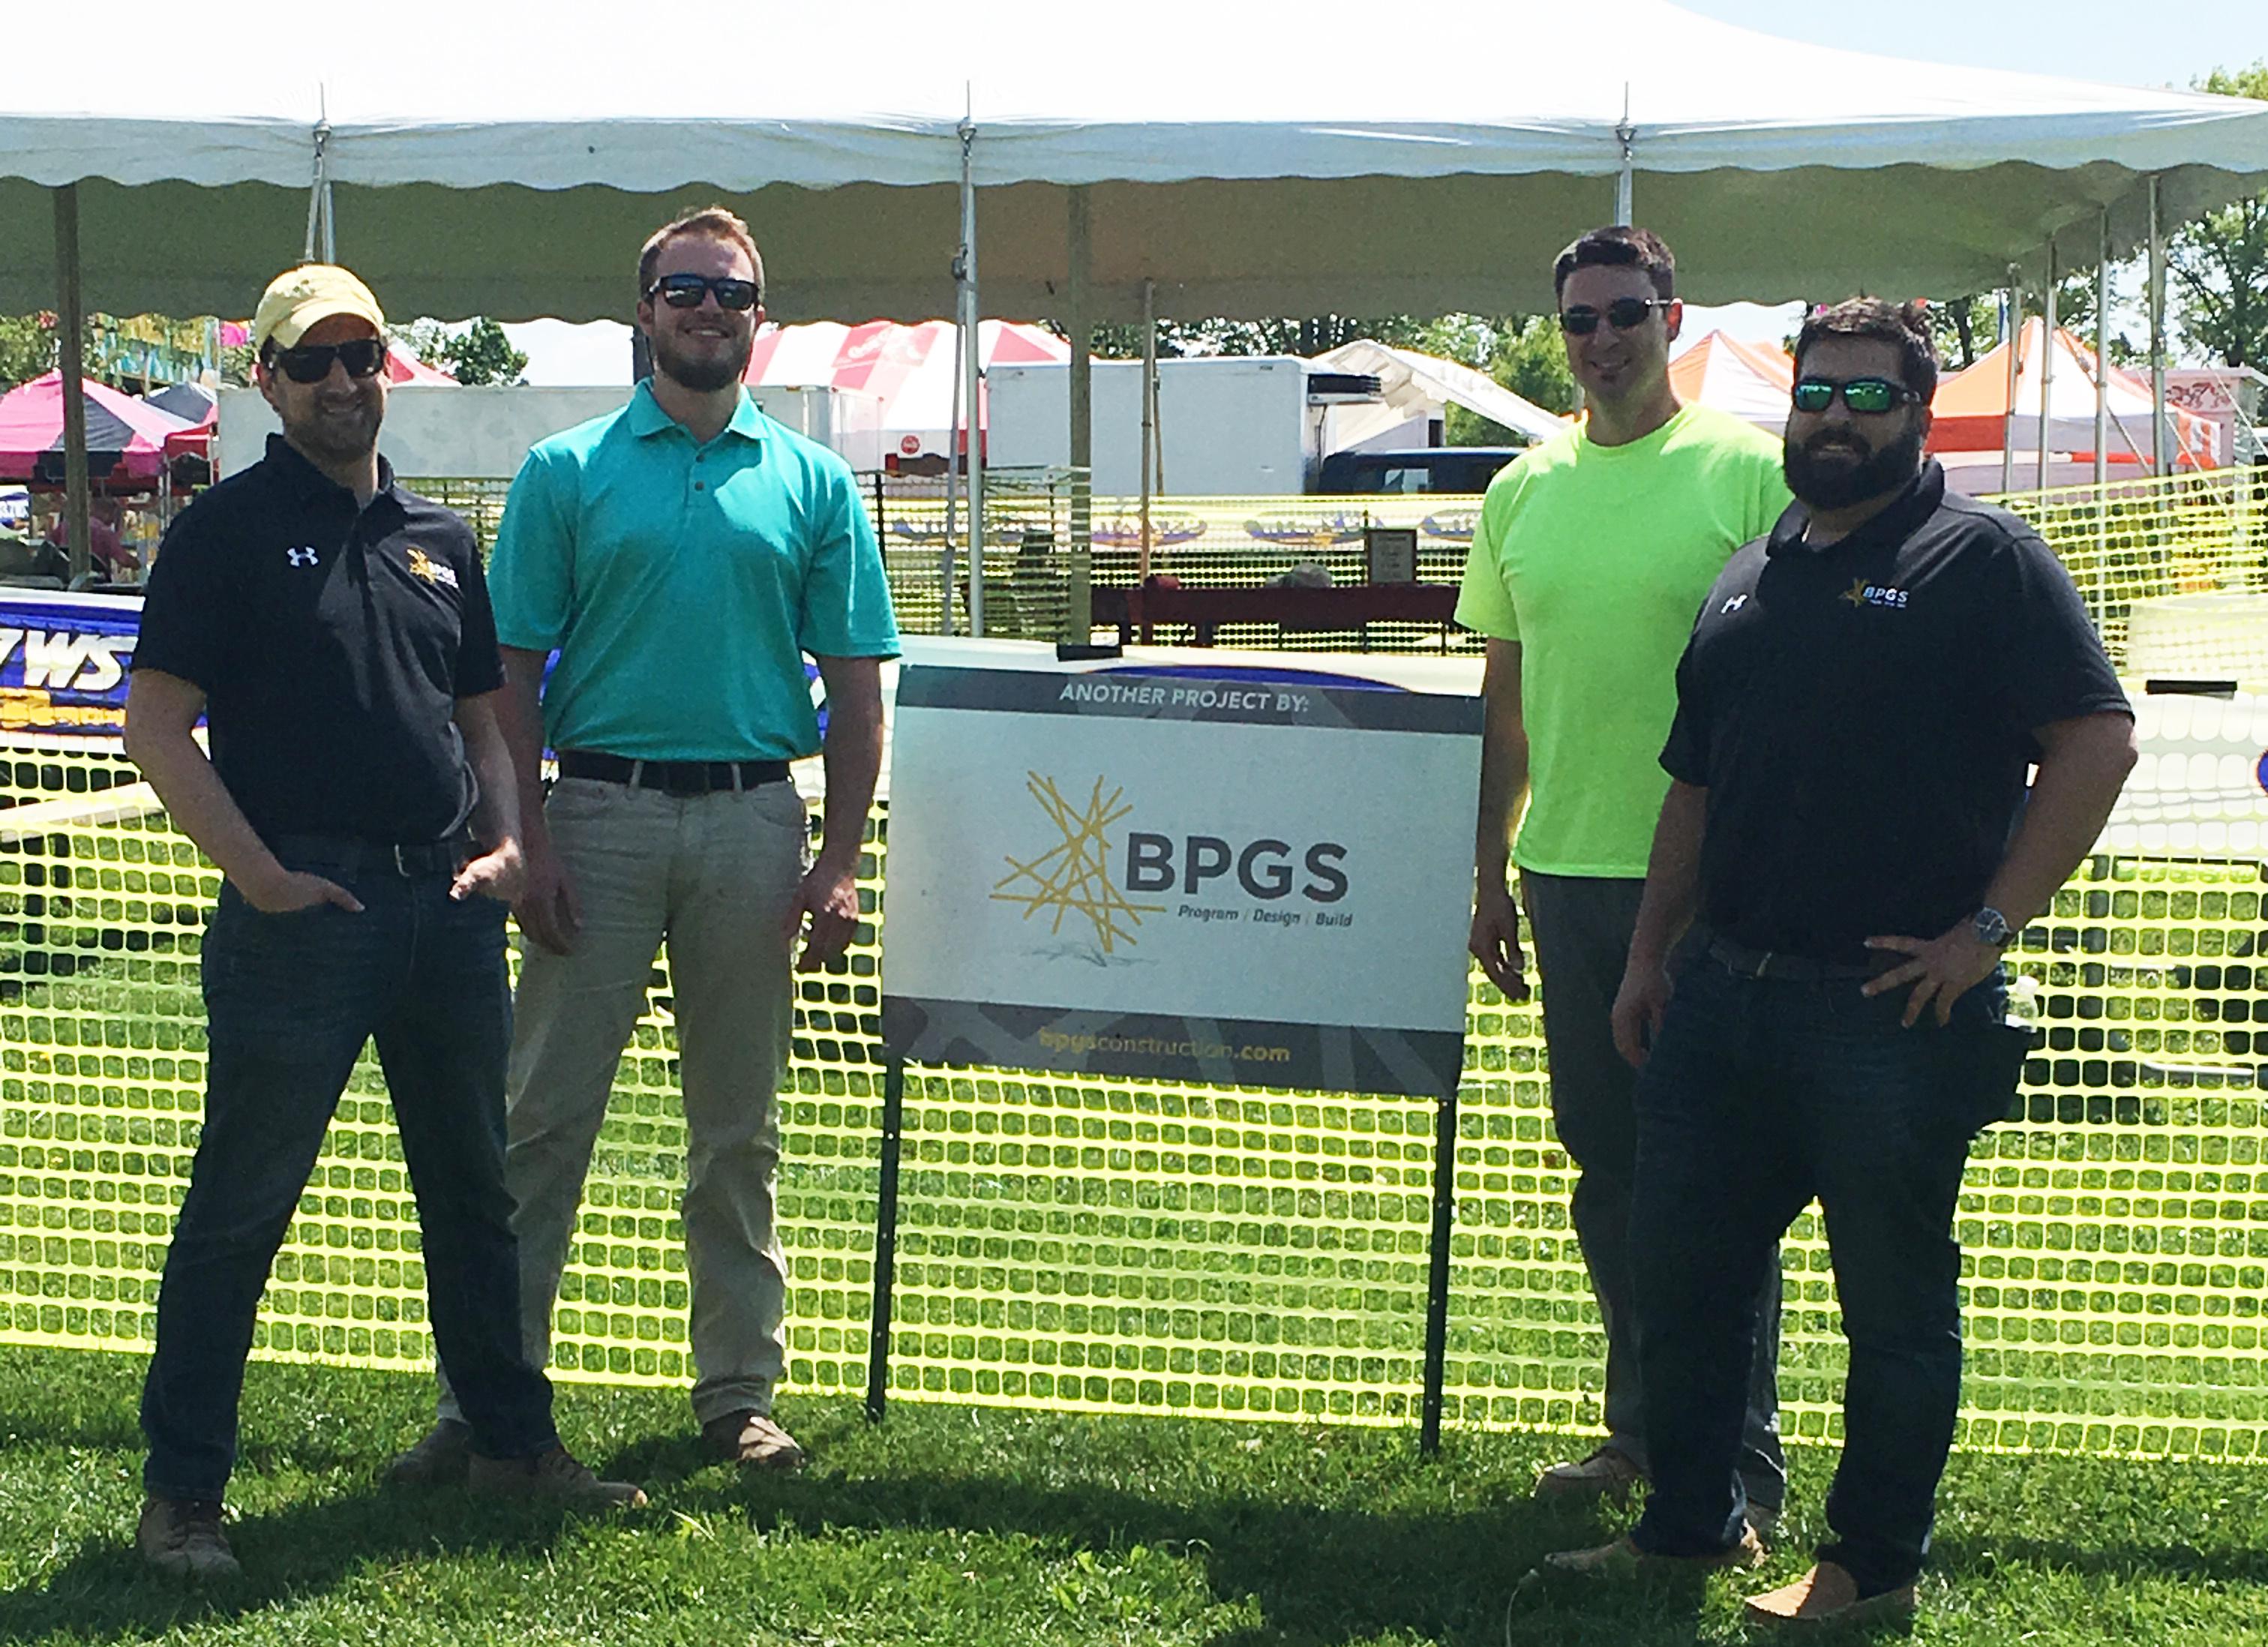 BPGS Construction Wilmington Flower Market